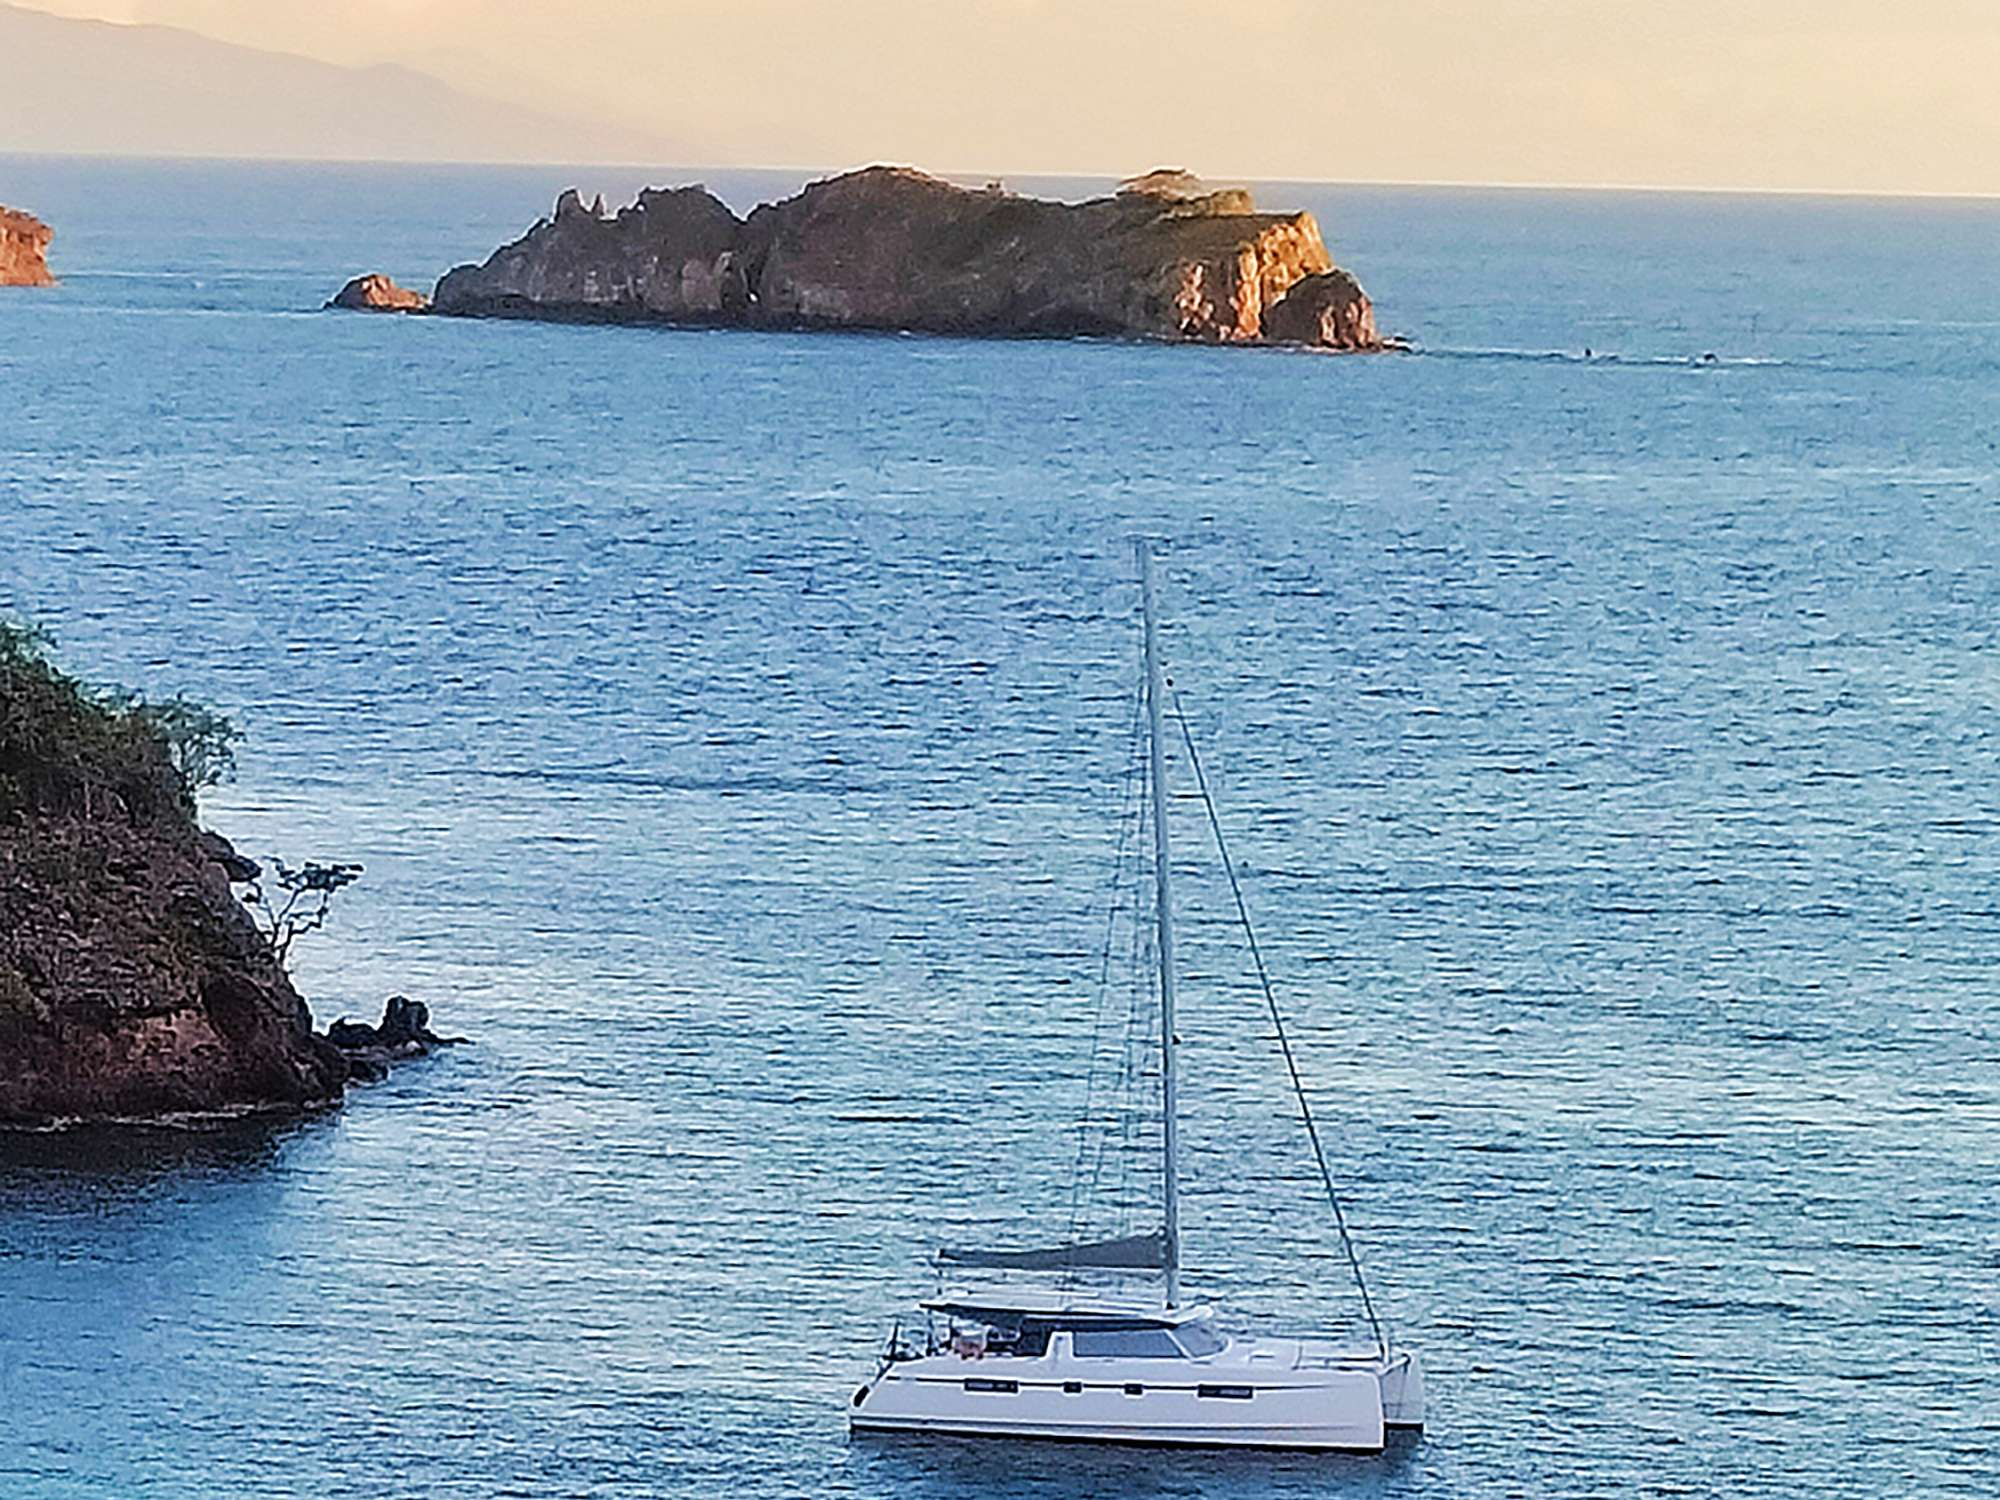 Illusion sailing in the Caribbean